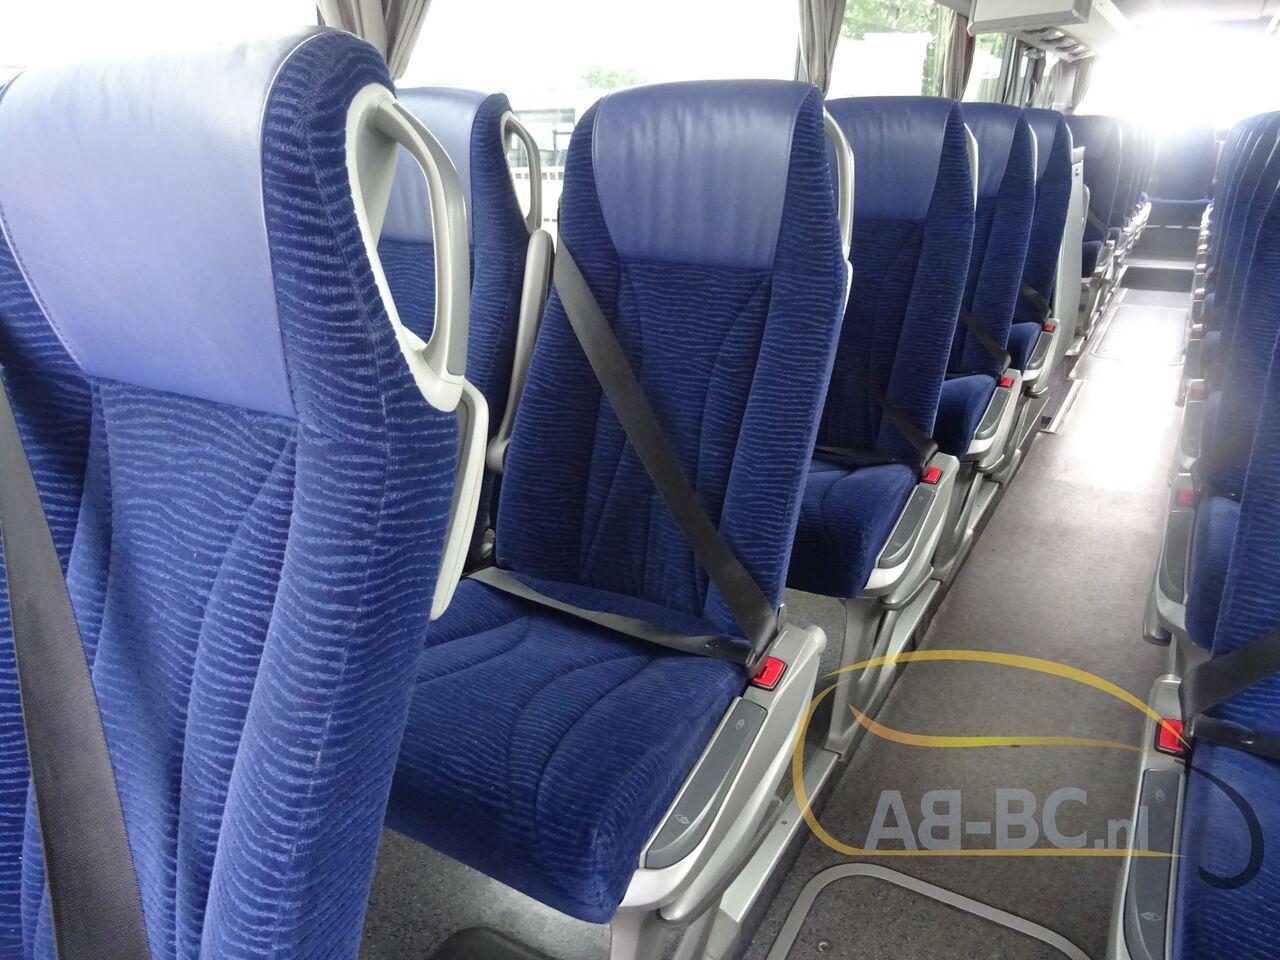 coach-busSETRA-S415-GT-HD-FINAL-EDITION---1627457203978591024_big_66f894152dc9993b19154418105b5572--21050713010665719300